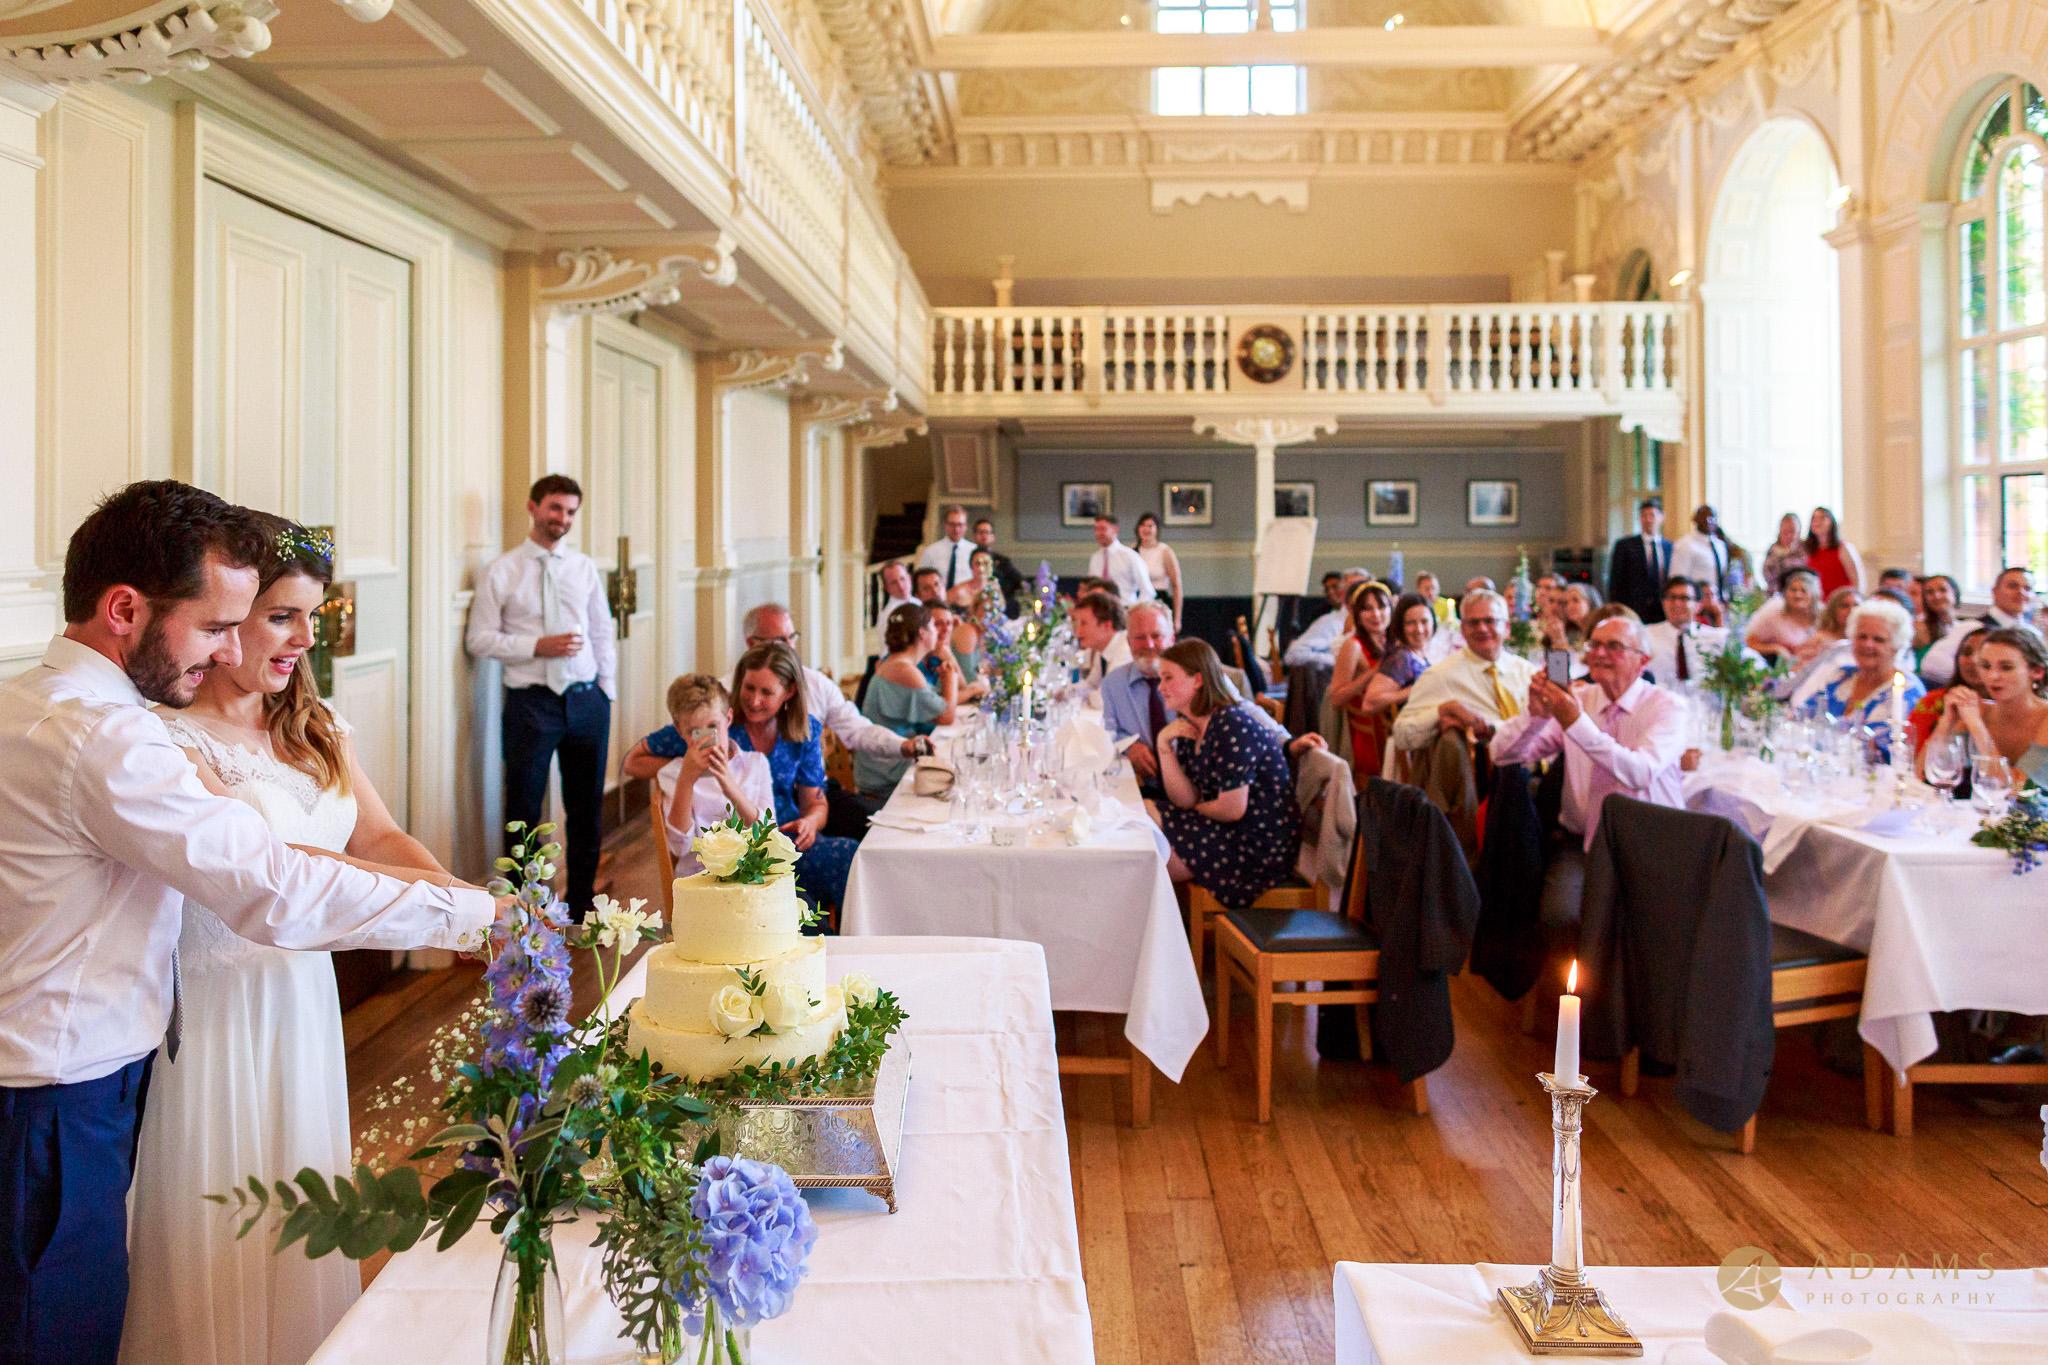 Wedding Photographer Cambridge cutting the cake at Newnham College